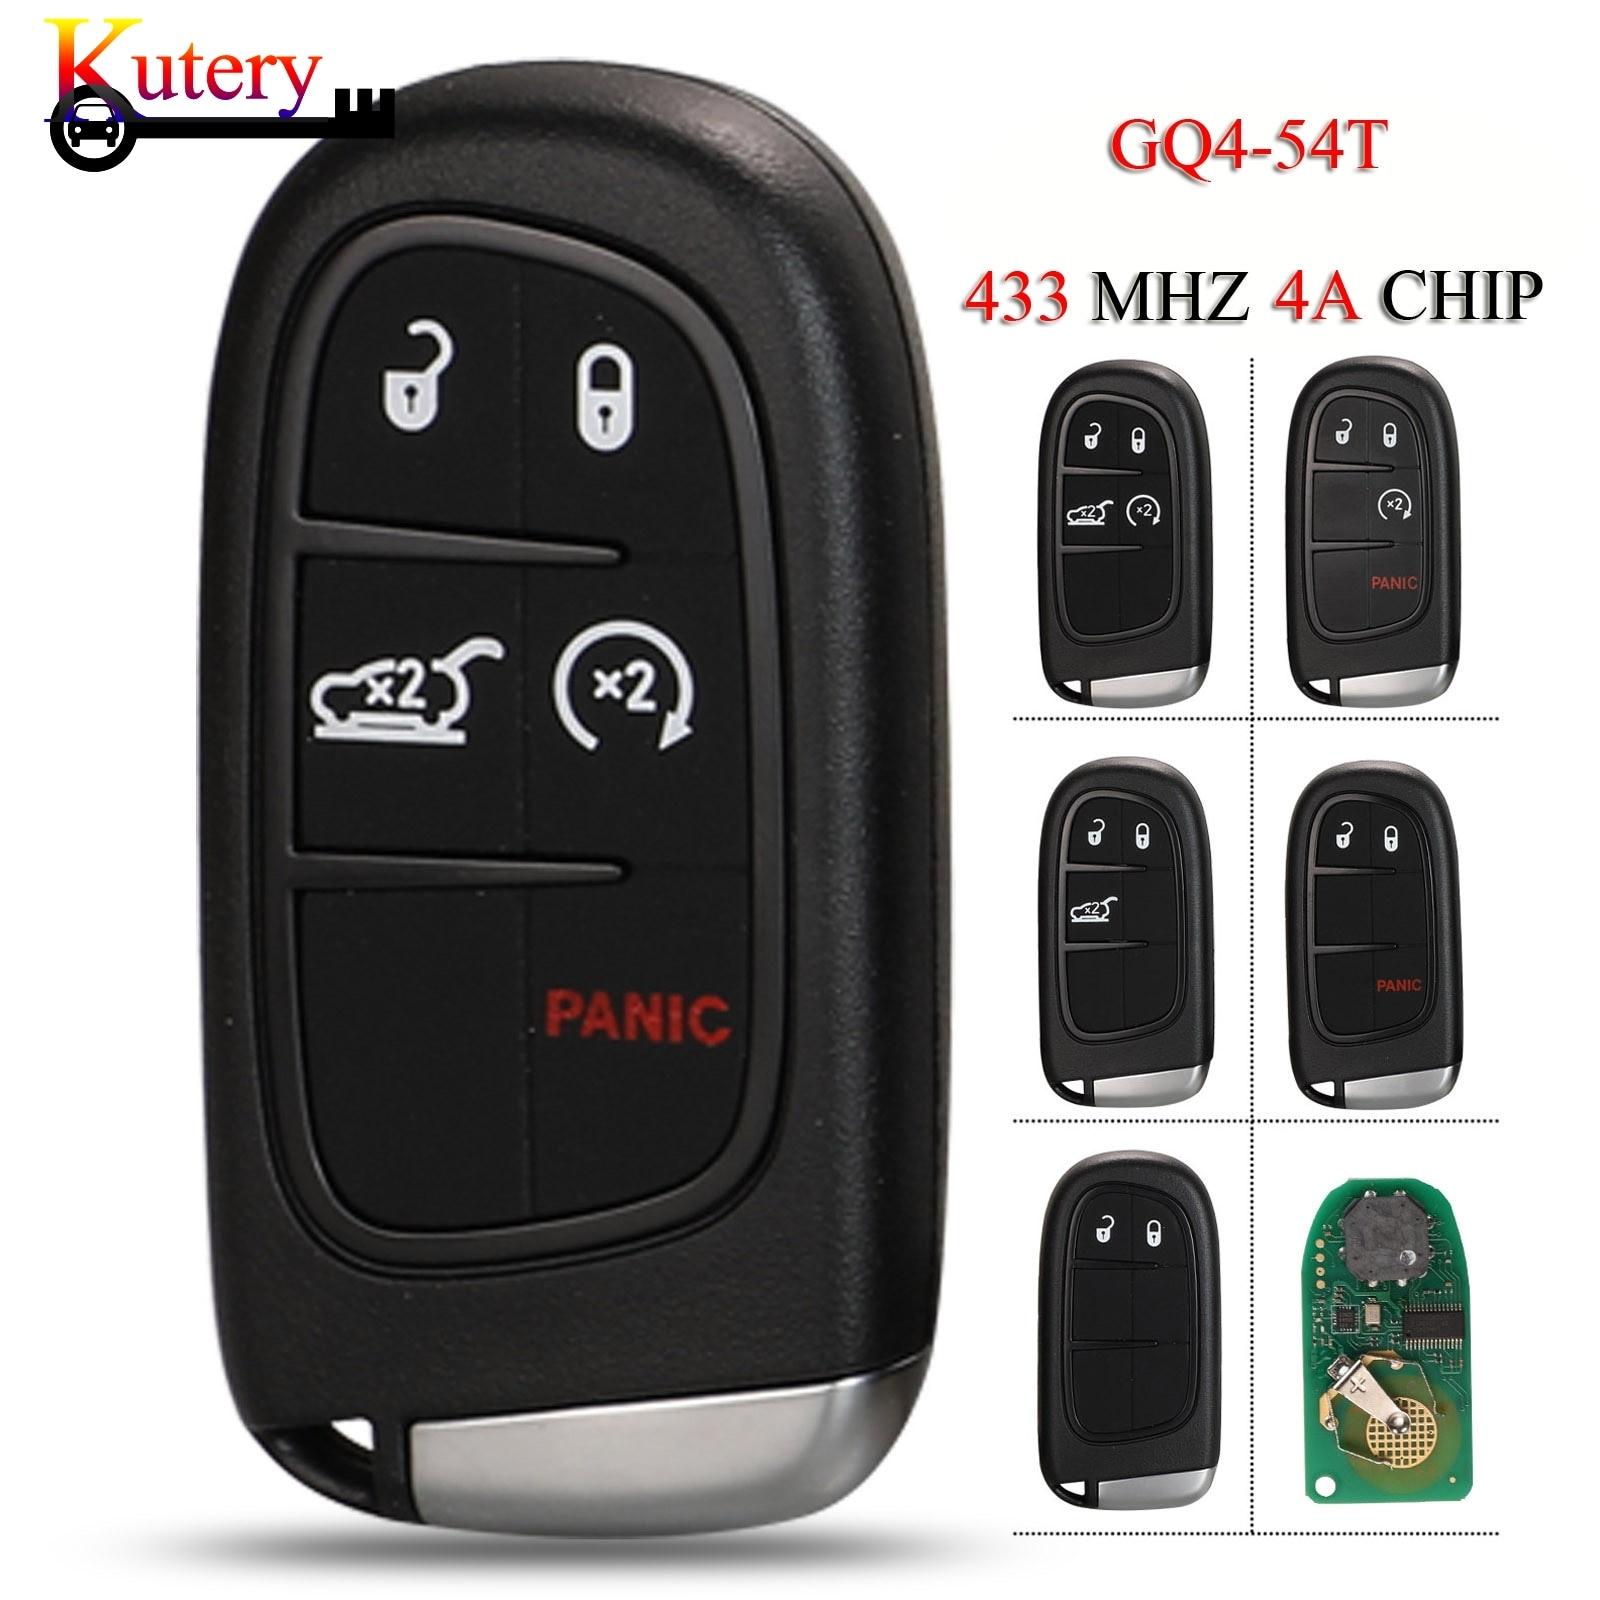 Kutery 5 pçs/lote remoto inteligente keyless ir chave do carro para jeep cherokee dodge ram durango chrysler 433mhz 4a pcf7938x chip GQ4-54T